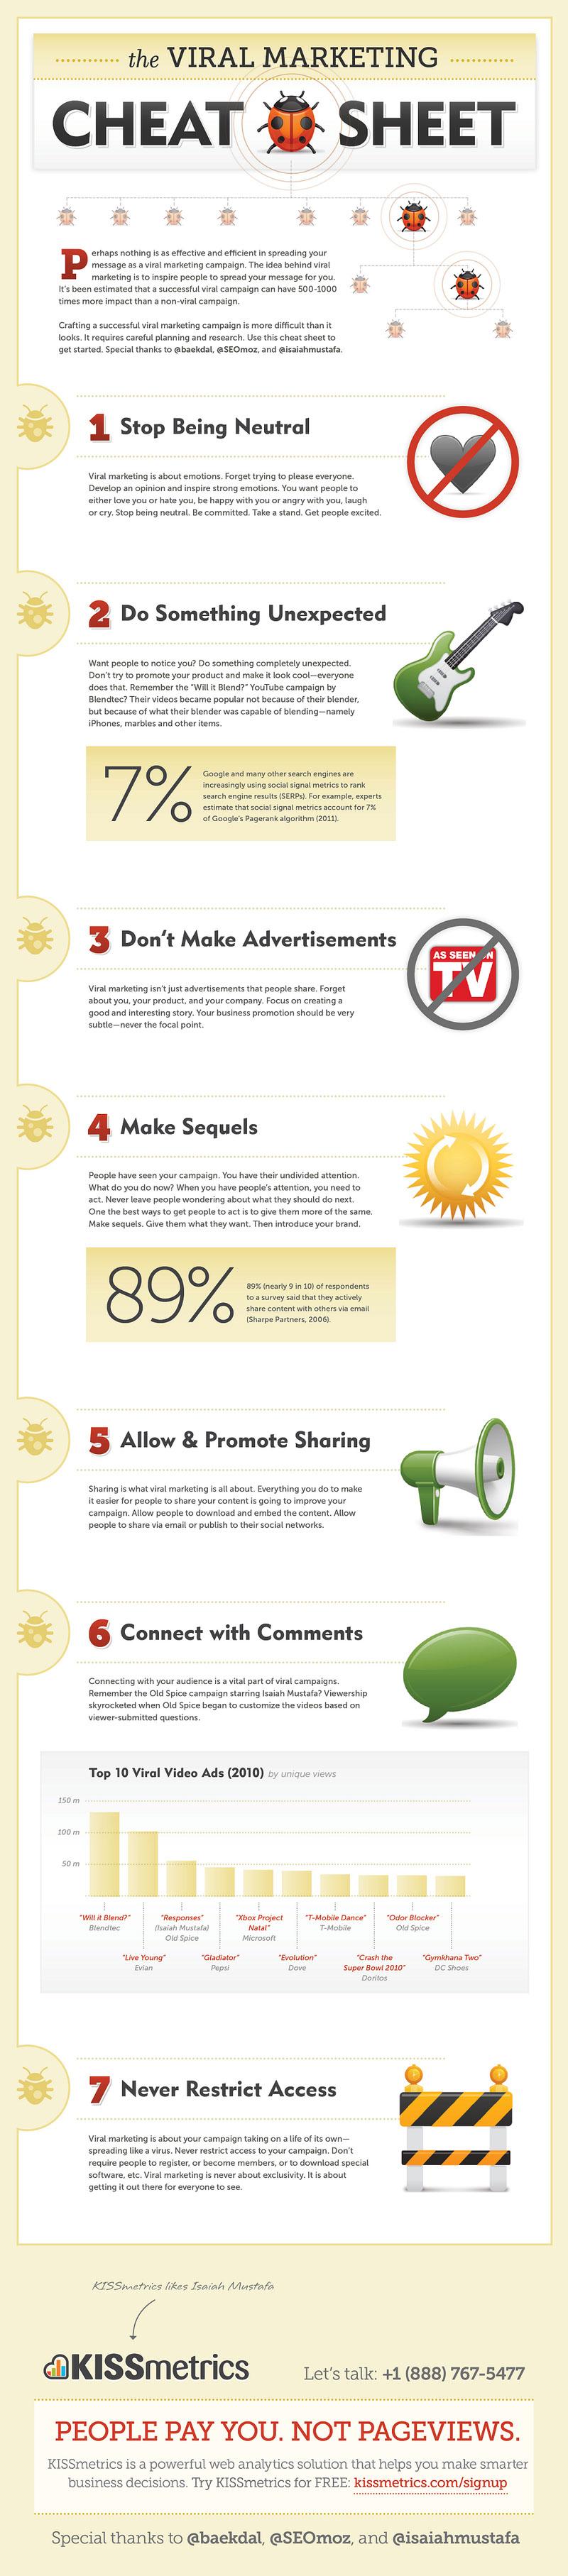 Viral-Marketing-Cheat-Sheet-infographic